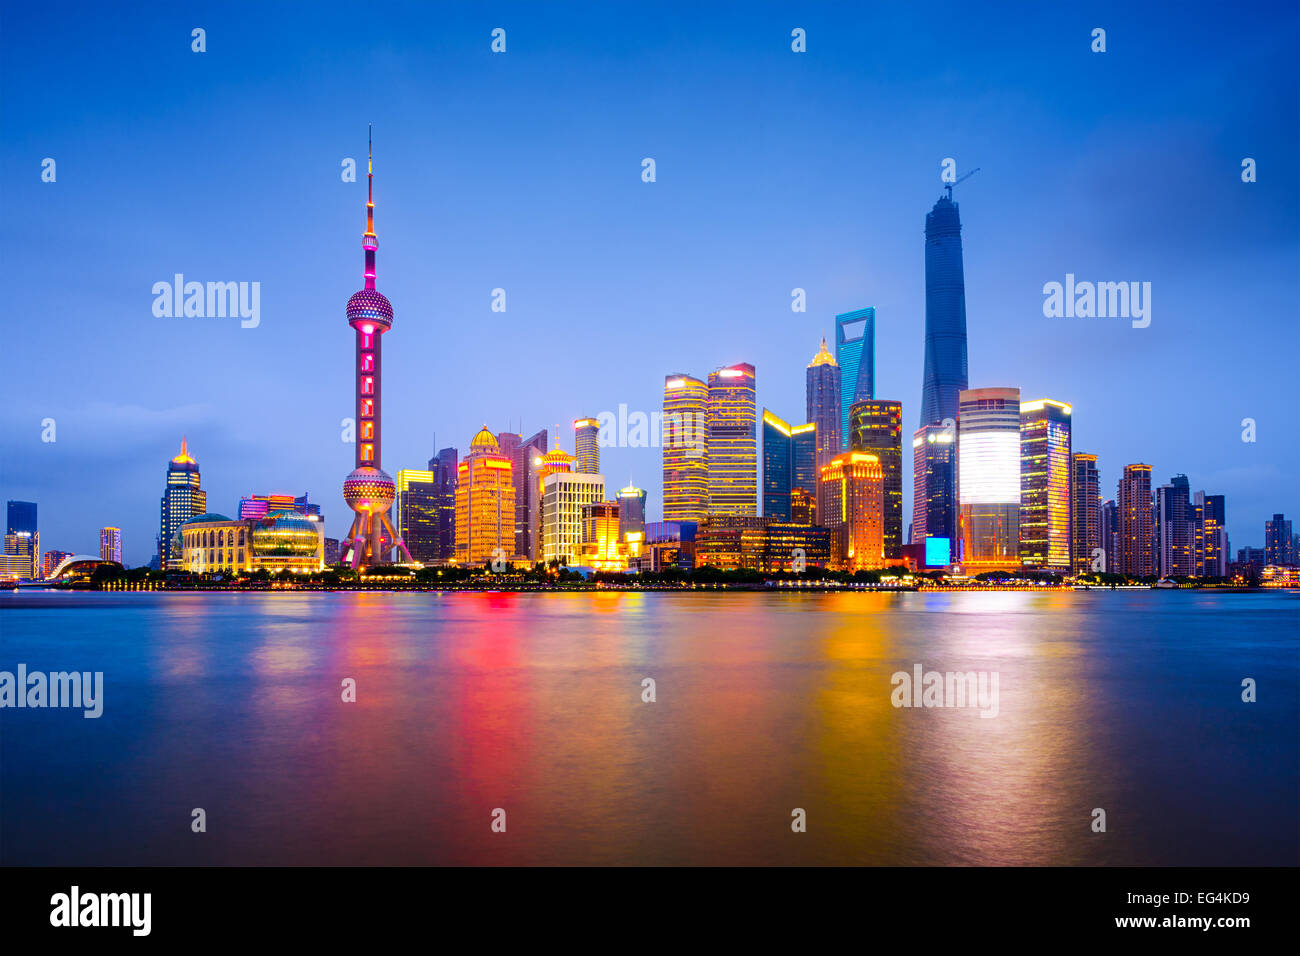 Shanghai, Cina skyline della città sul fiume Huangpu. Immagini Stock